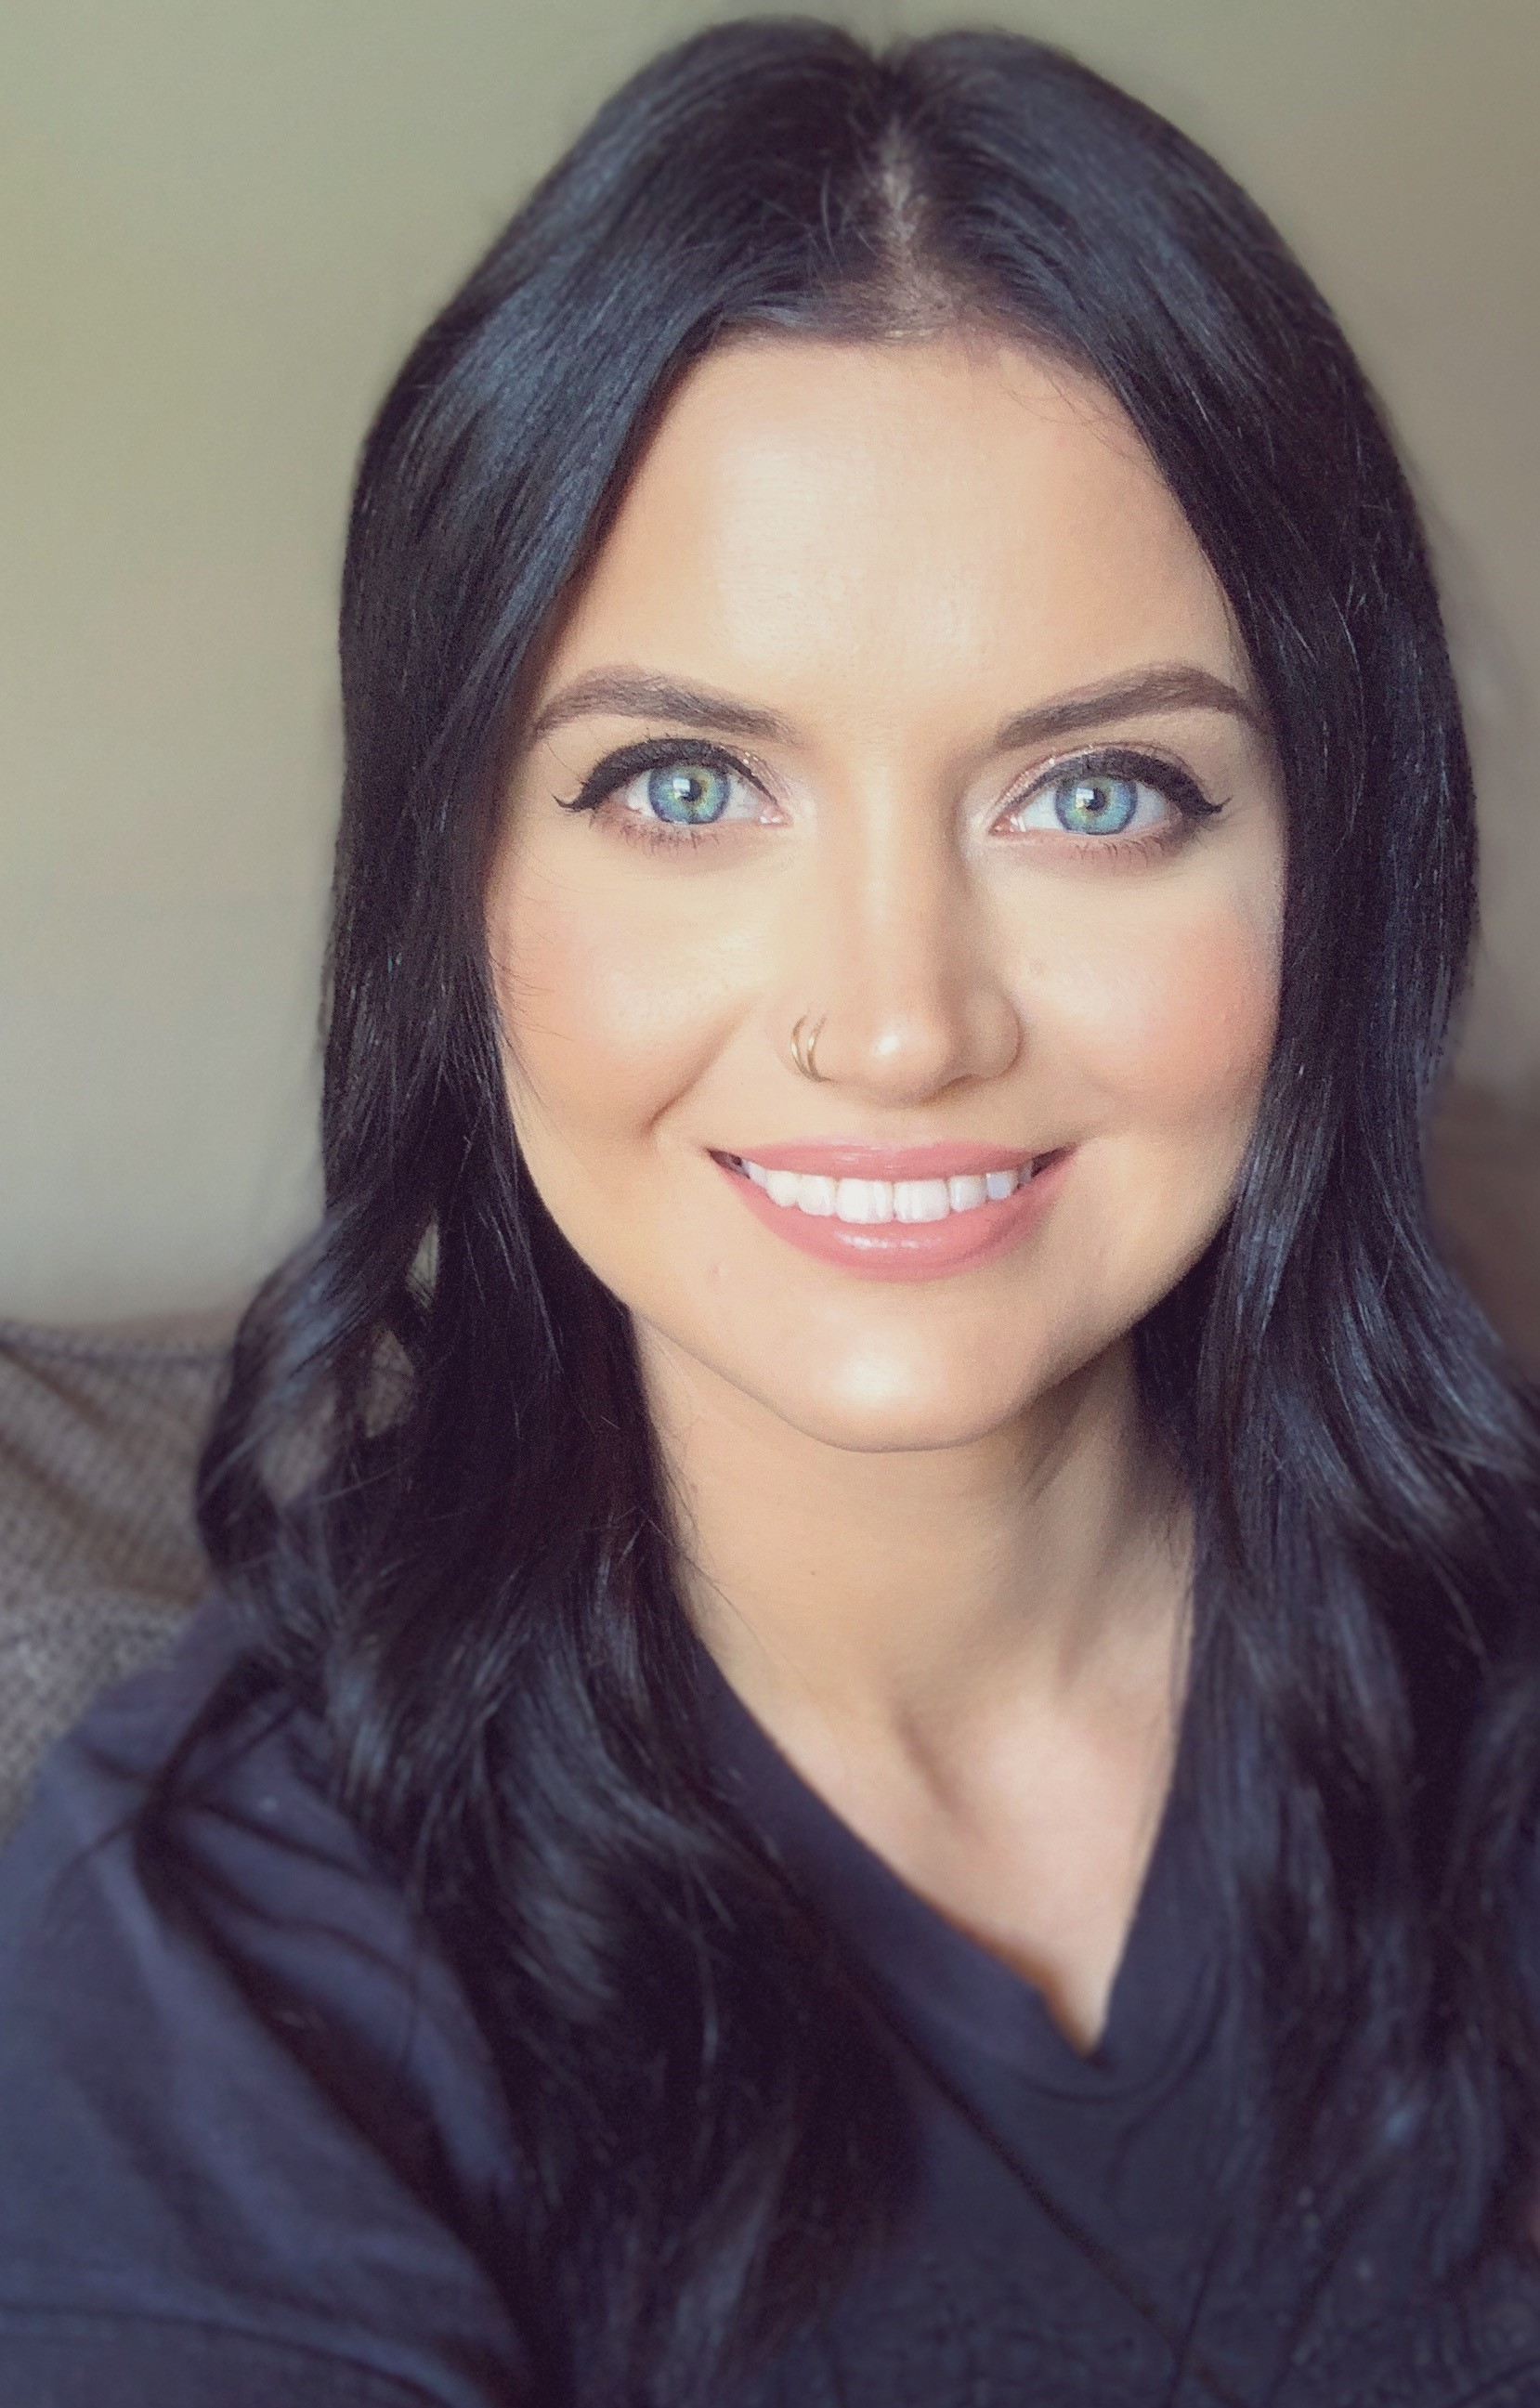 Paige Hovey